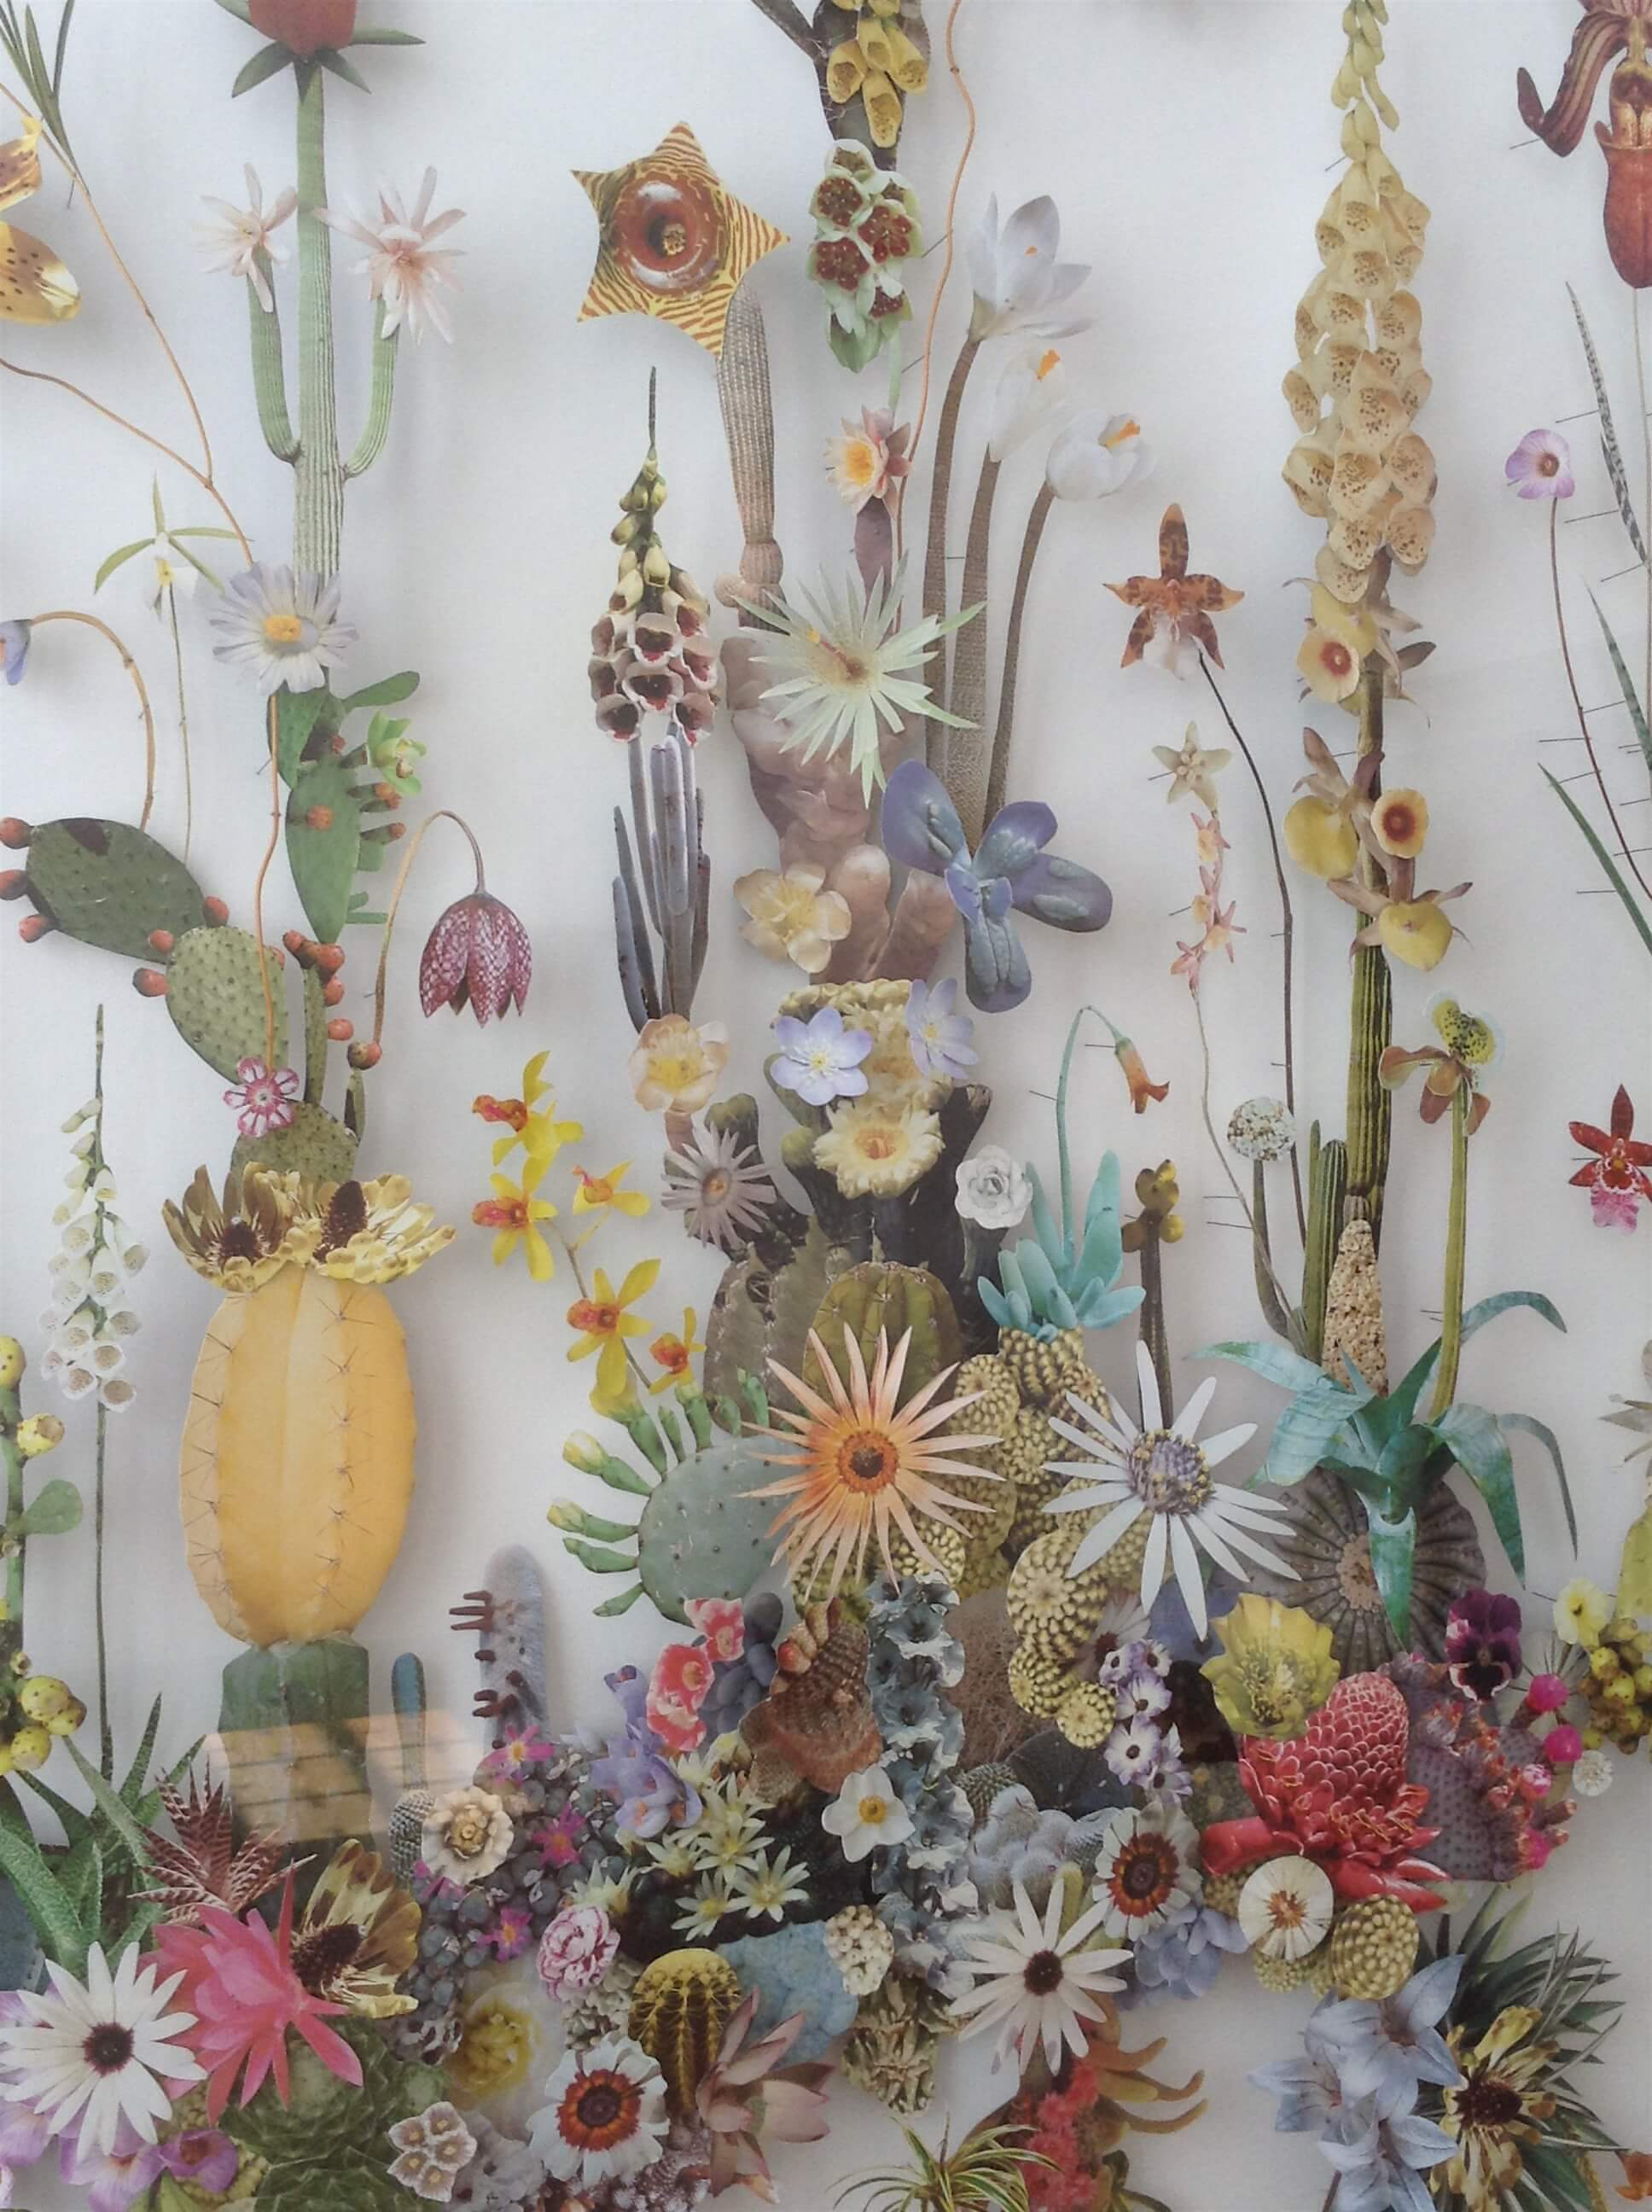 Anne ten Donkelaar's paper flowers